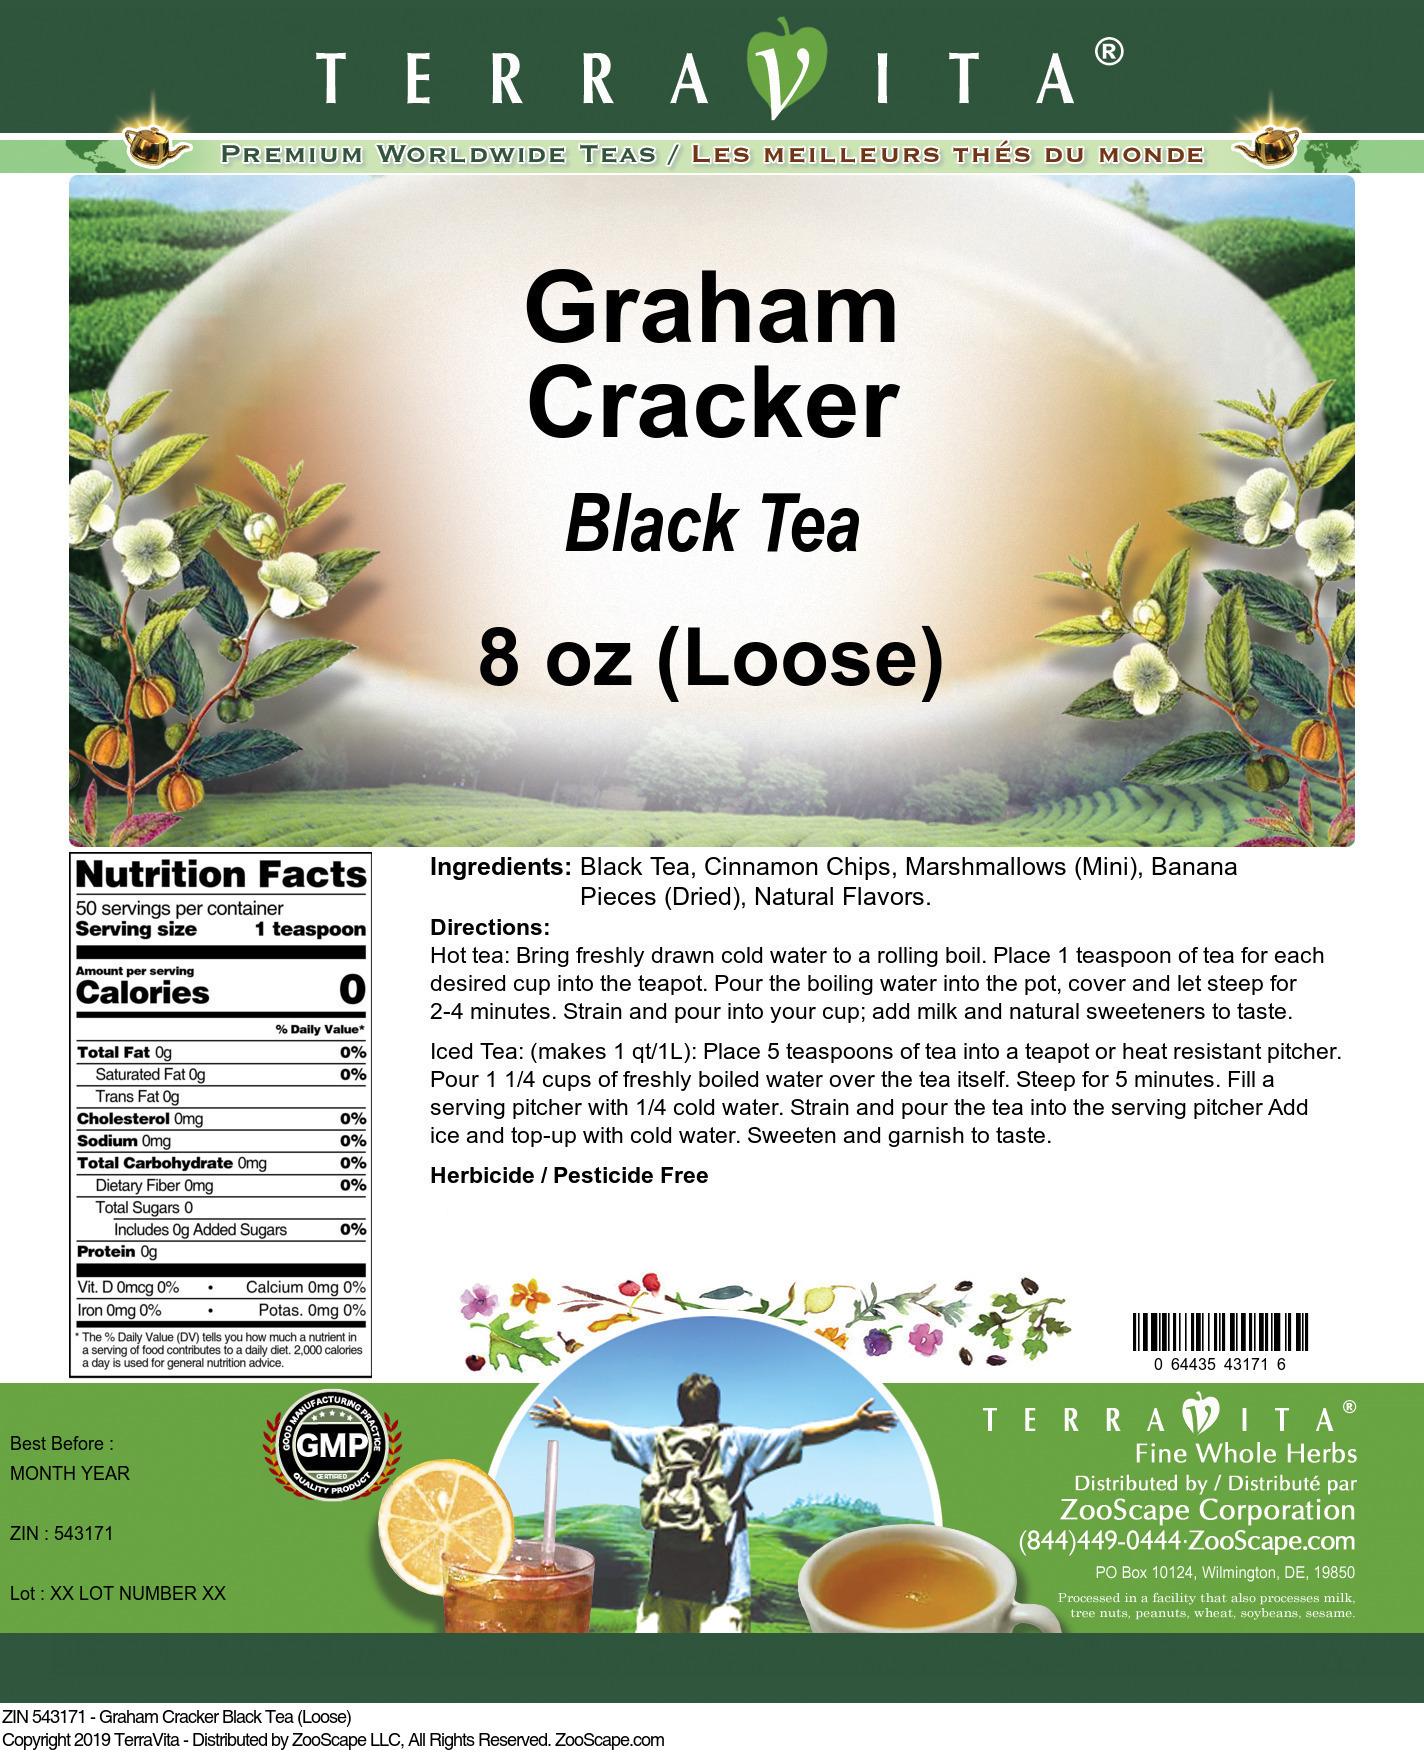 Graham Cracker Black Tea (Loose)